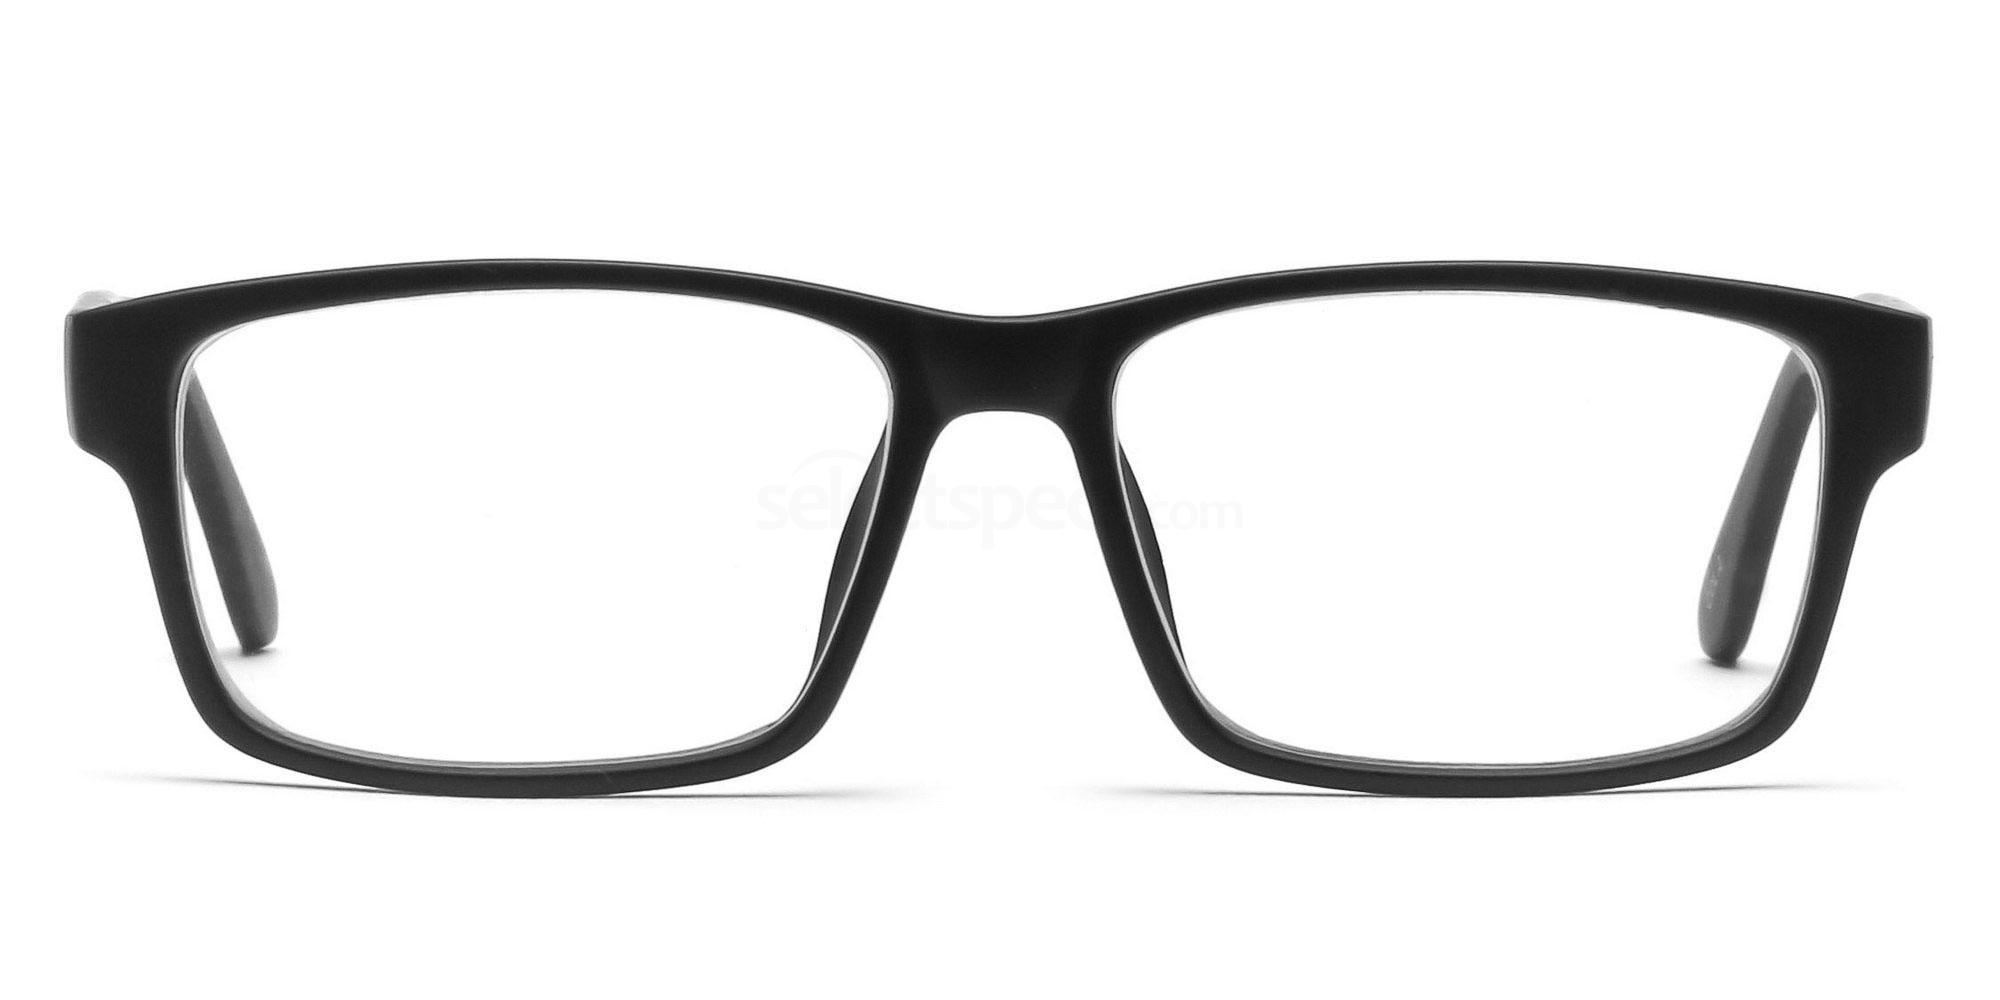 COL.02 2376 - Black Glasses, Savannah